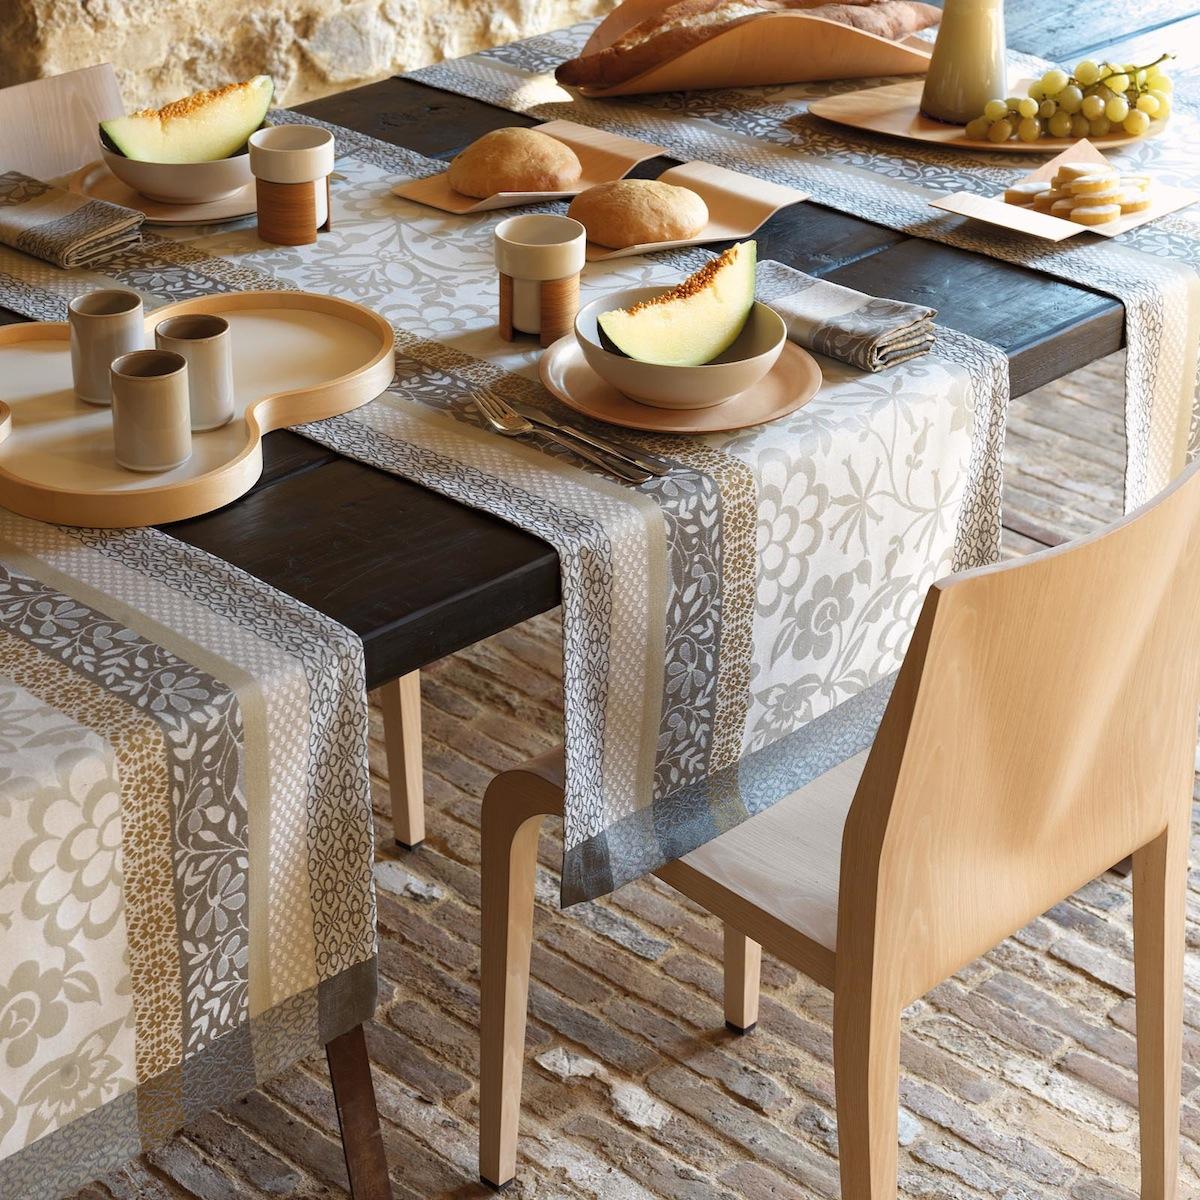 Chemin de table en coton calisson 55 x 150